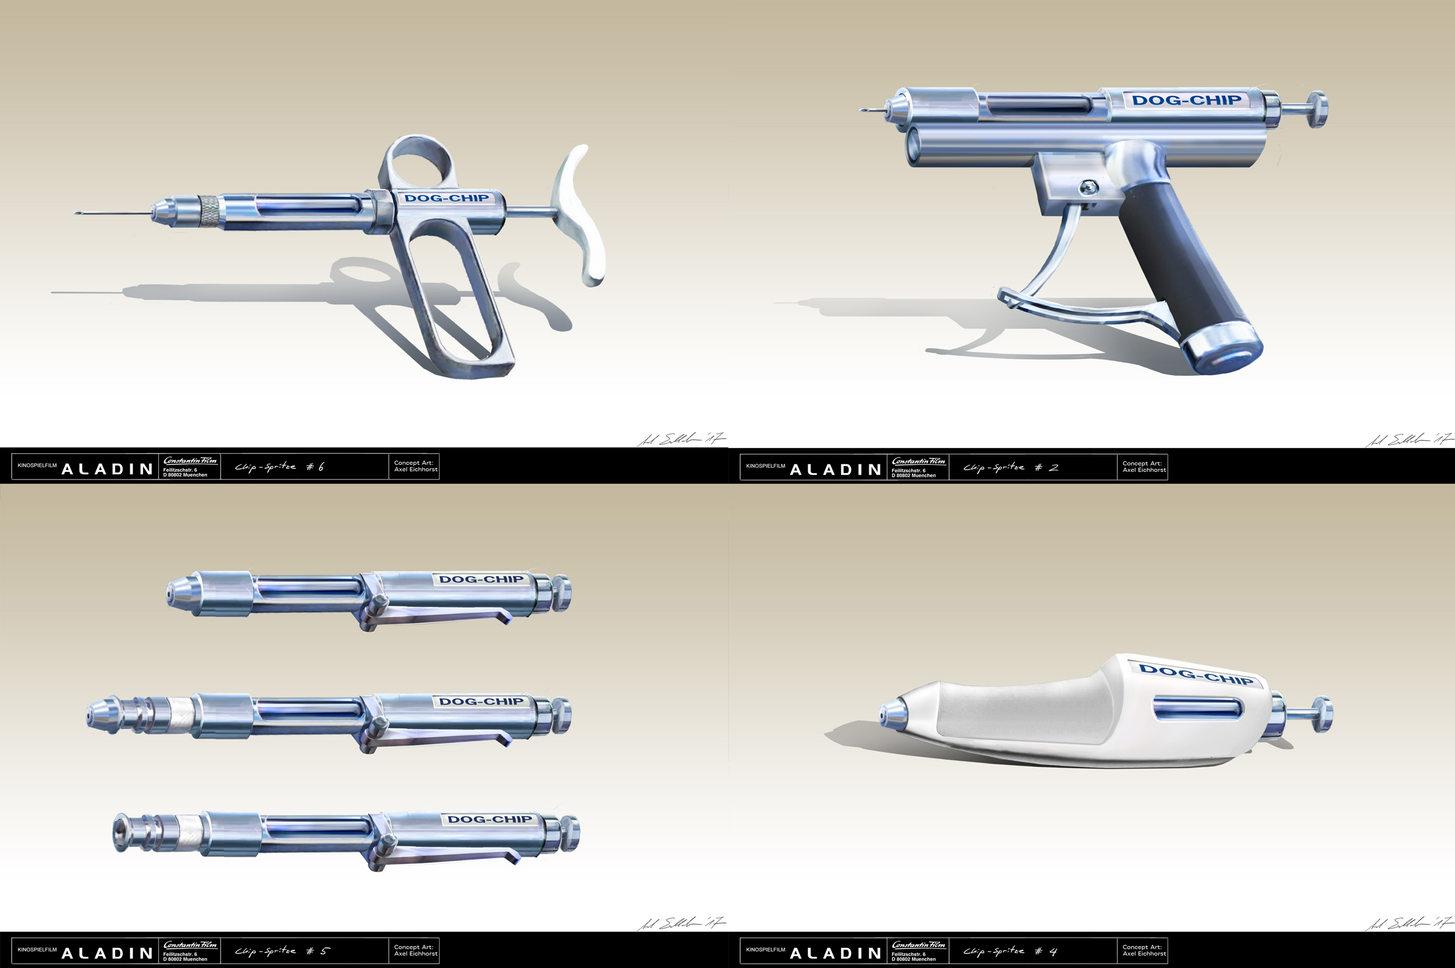 Chip-Gun Versions